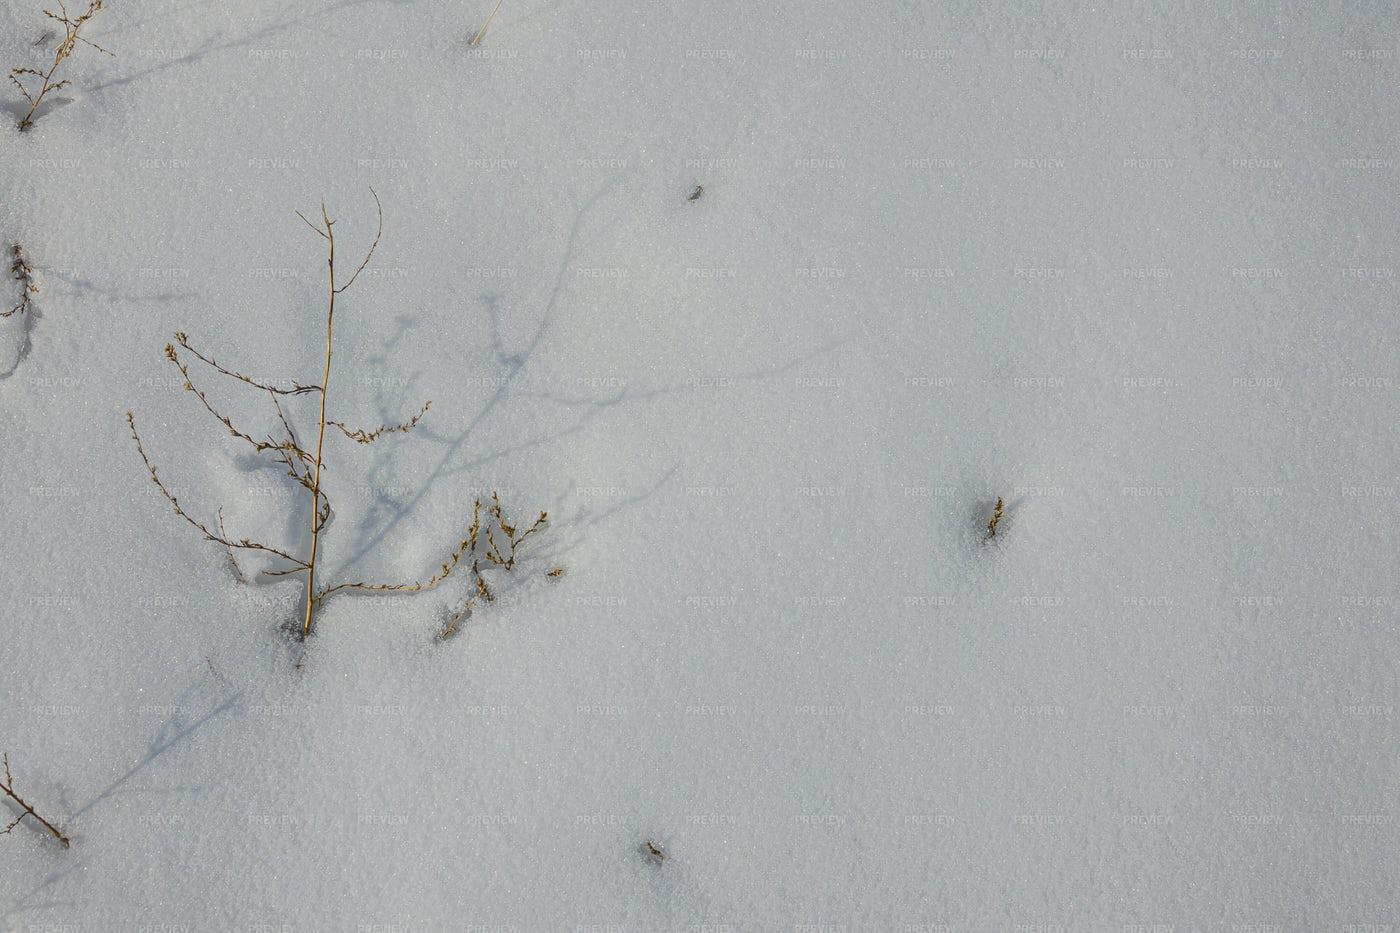 White Snow Texture With Dry Grass: Stock Photos